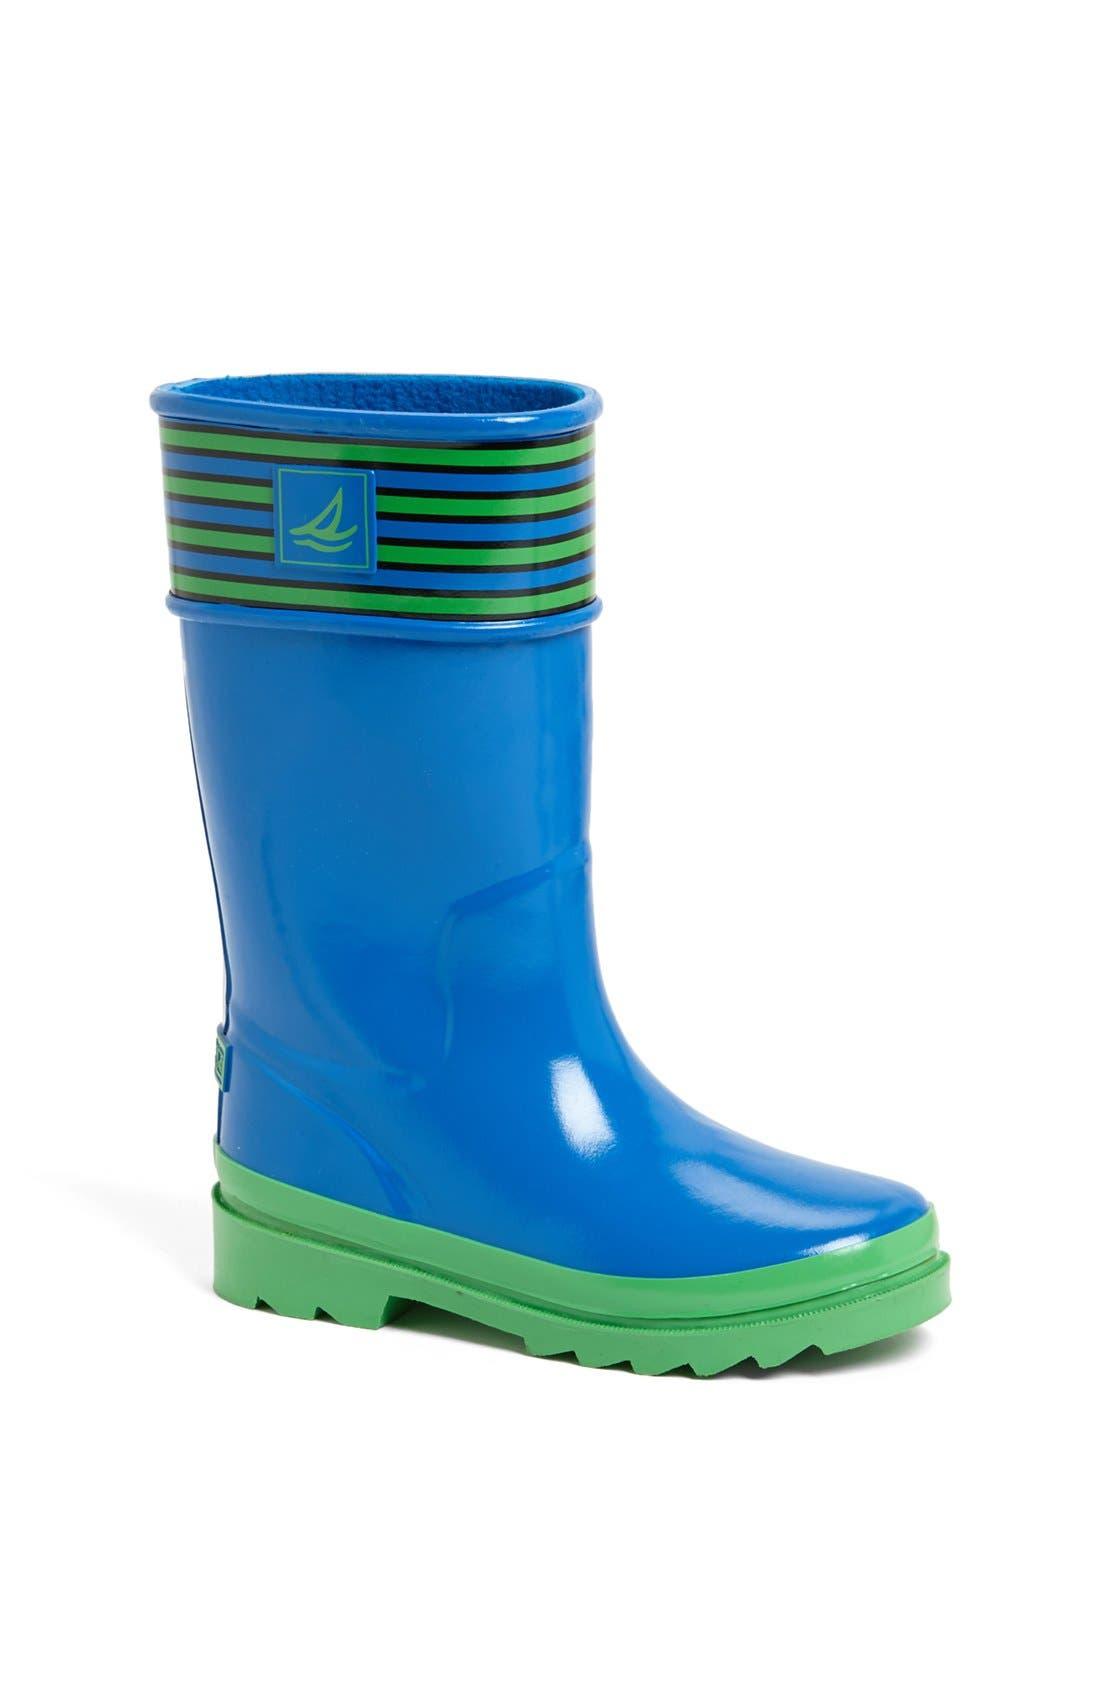 Alternate Image 1 Selected - Sperry Kids 'Pelican' Rain Boot (Walker, Toddler, Little Kid & Big Kid)